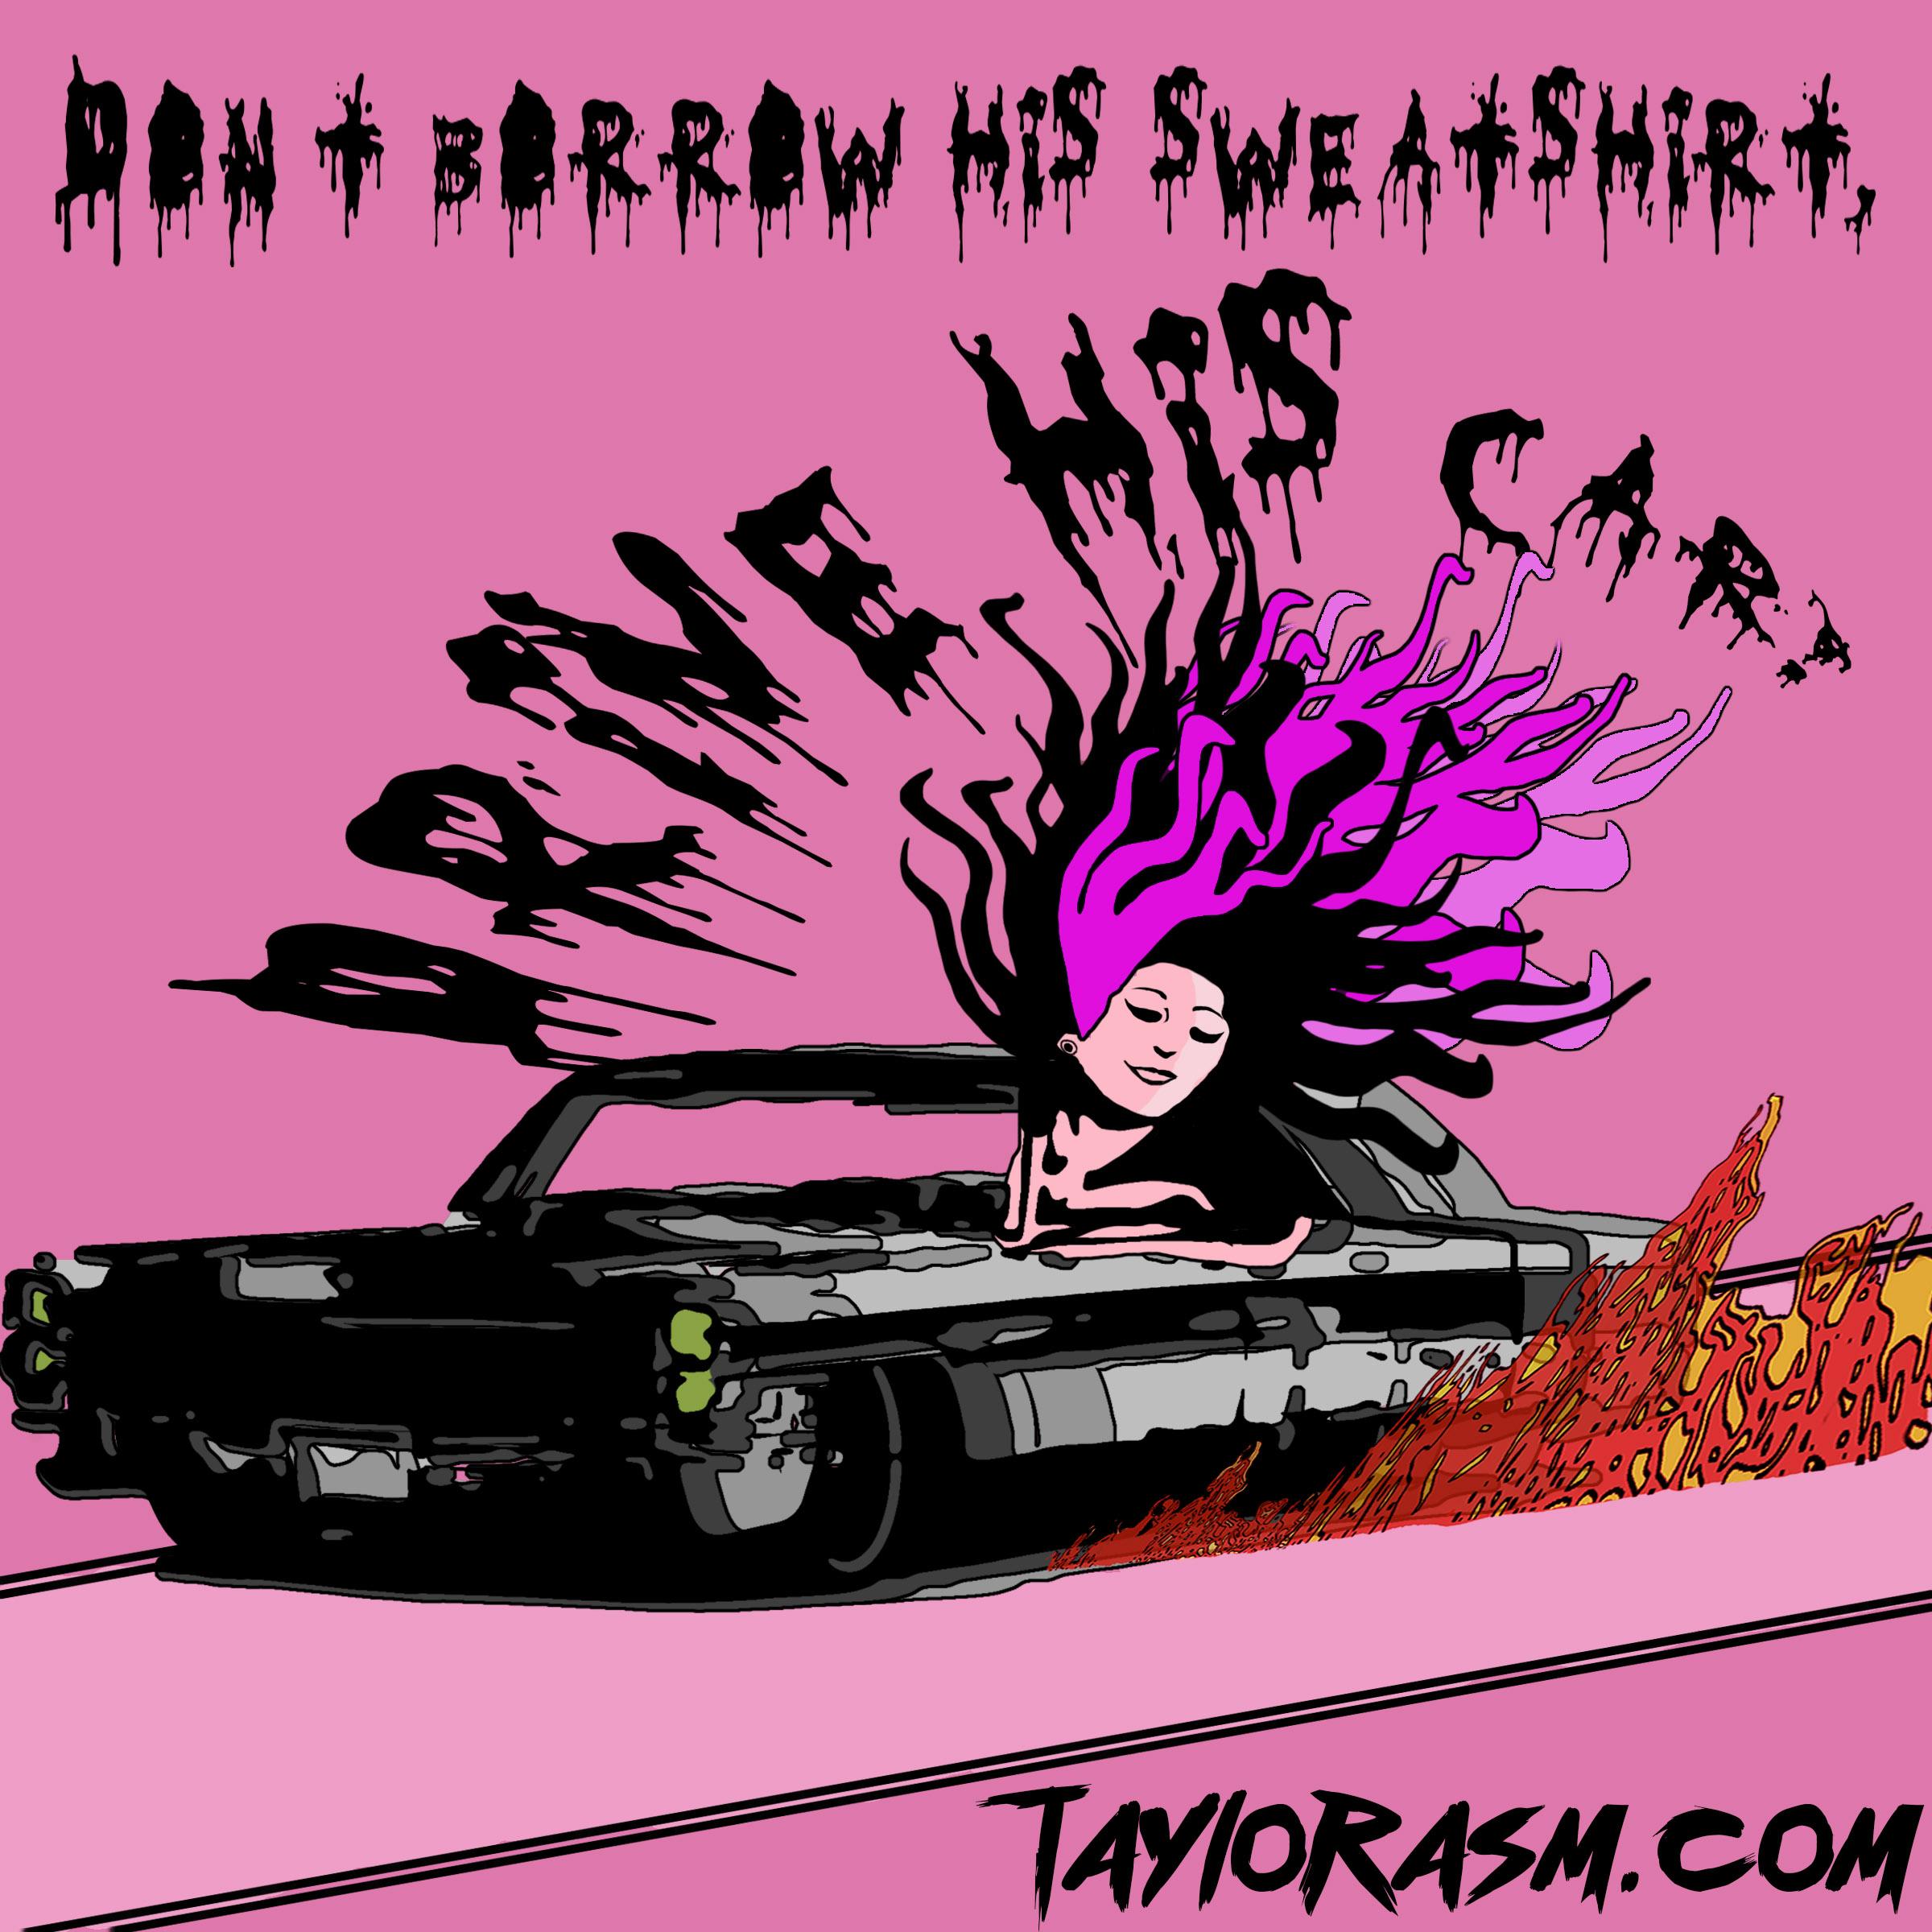 drivehiscar